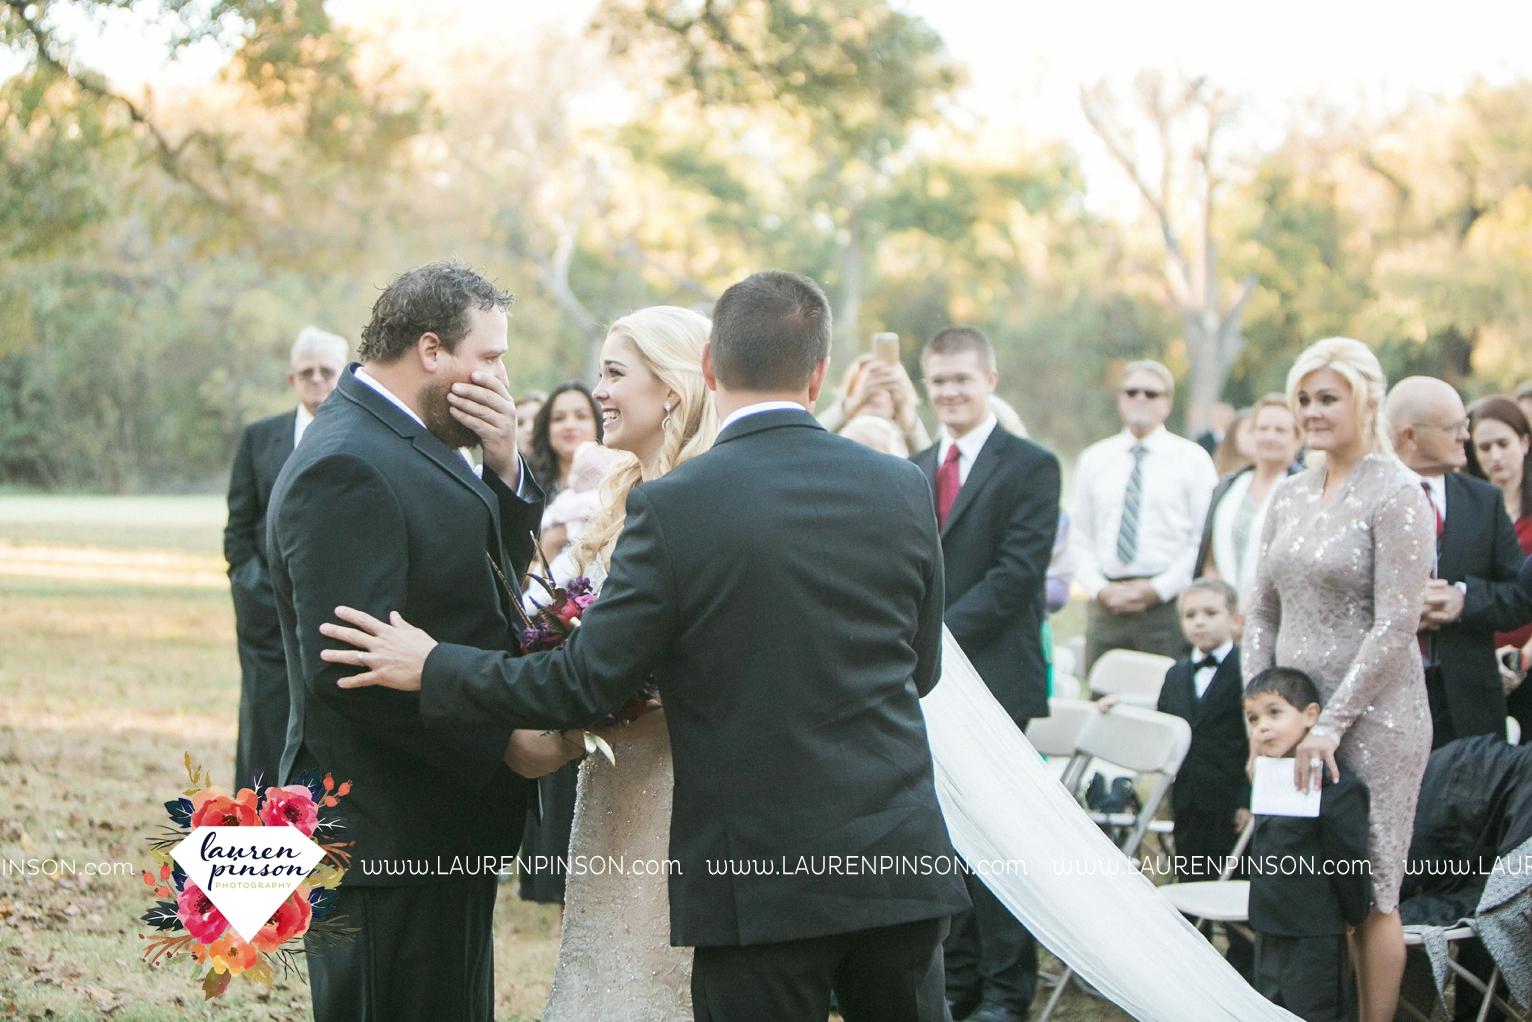 rustic-wichita-falls-texas-wedding-photographer-gold-glam-mayfield-events-market-street-united-allue-bridals-fall_1680.jpg